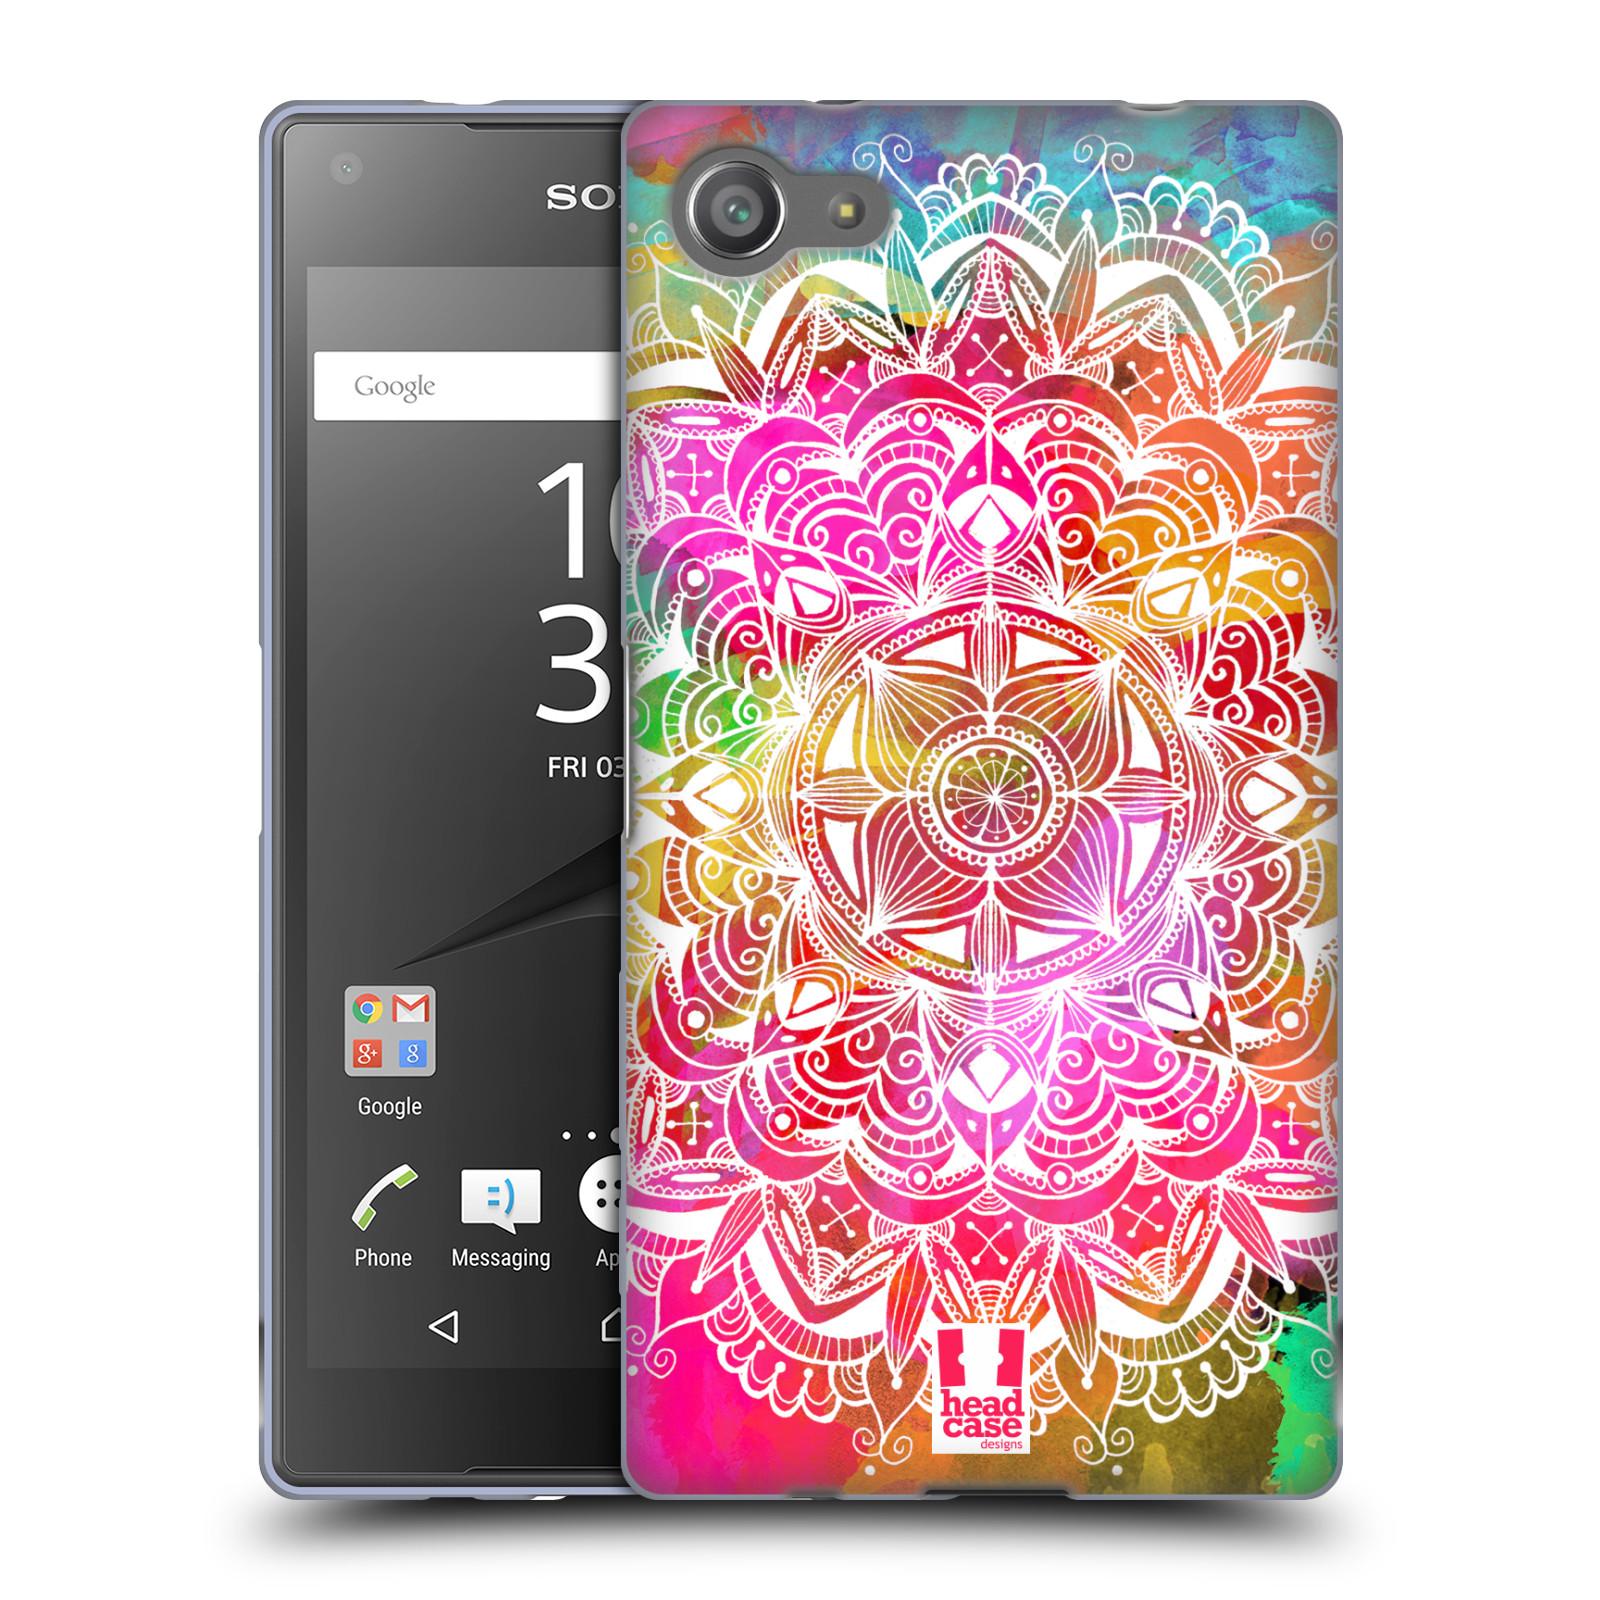 Silikonové pouzdro na mobil Sony Xperia Z5 Compact HEAD CASE Mandala Doodle Watercolour (Silikonový kryt či obal na mobilní telefon Sony Xperia Z5 Compact E5823)